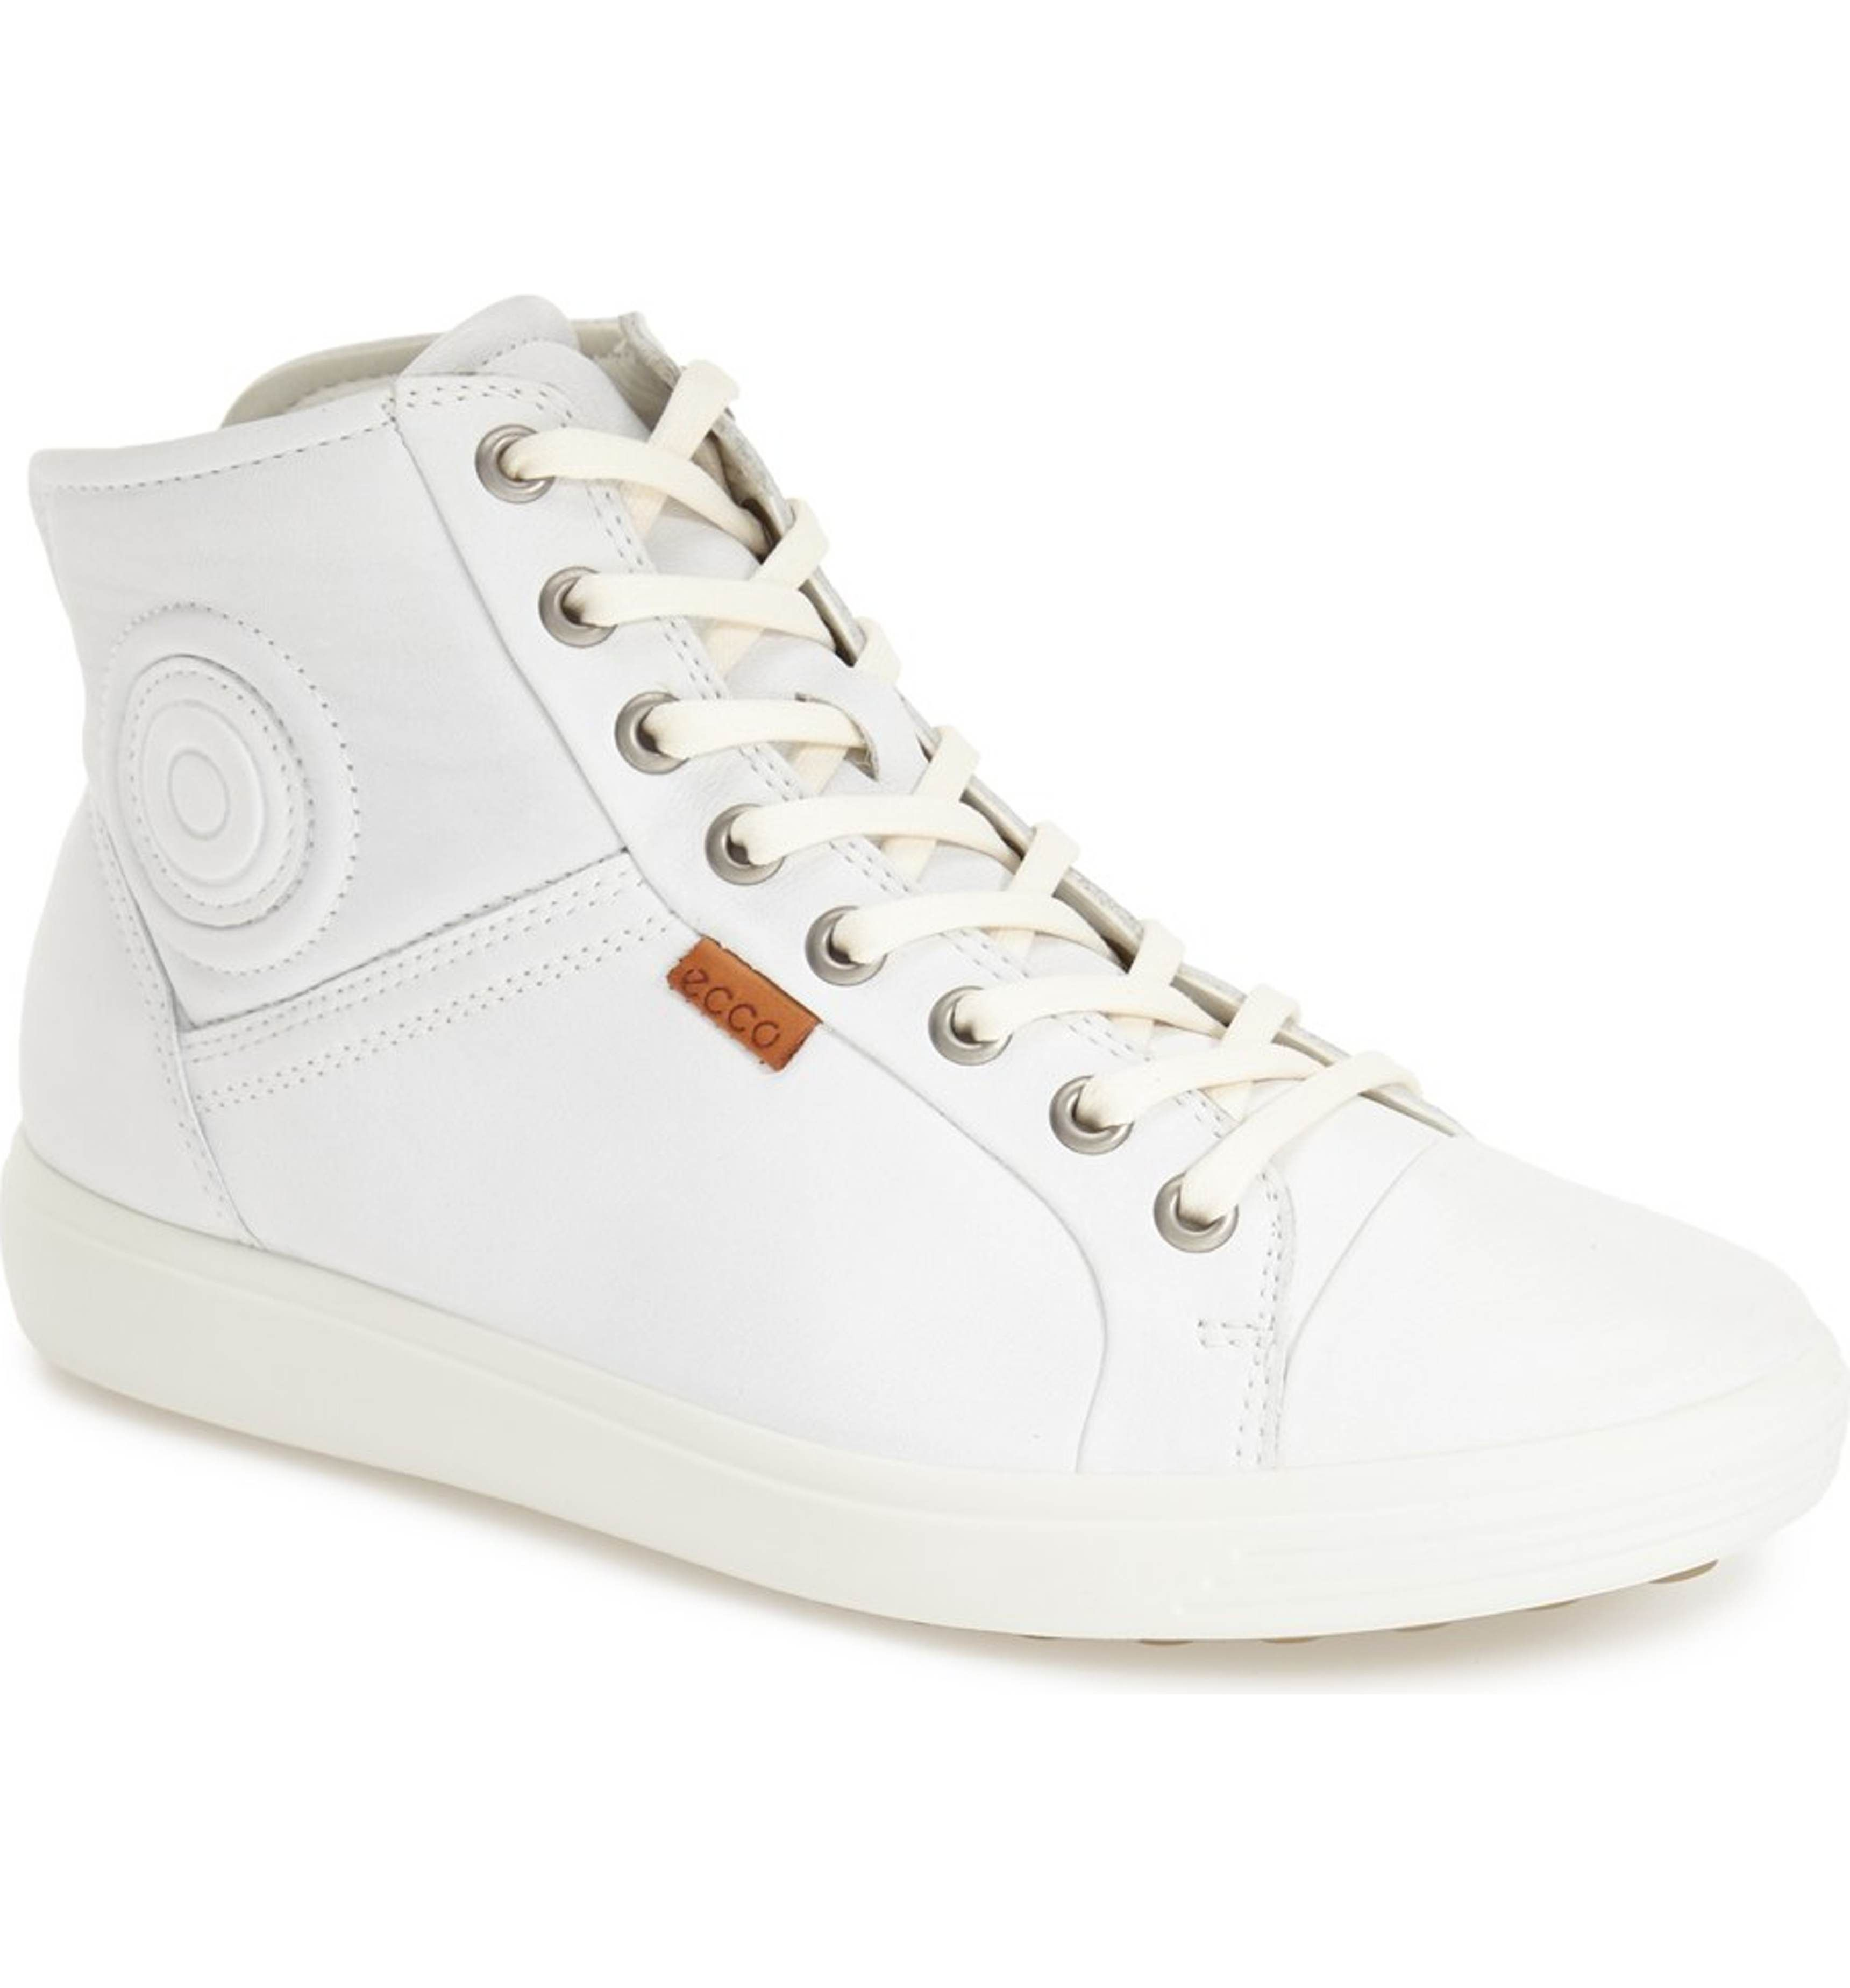 Ecco Soft 7 High Top Sneaker Women Sneakers High Top Sneakers Leather Sneakers